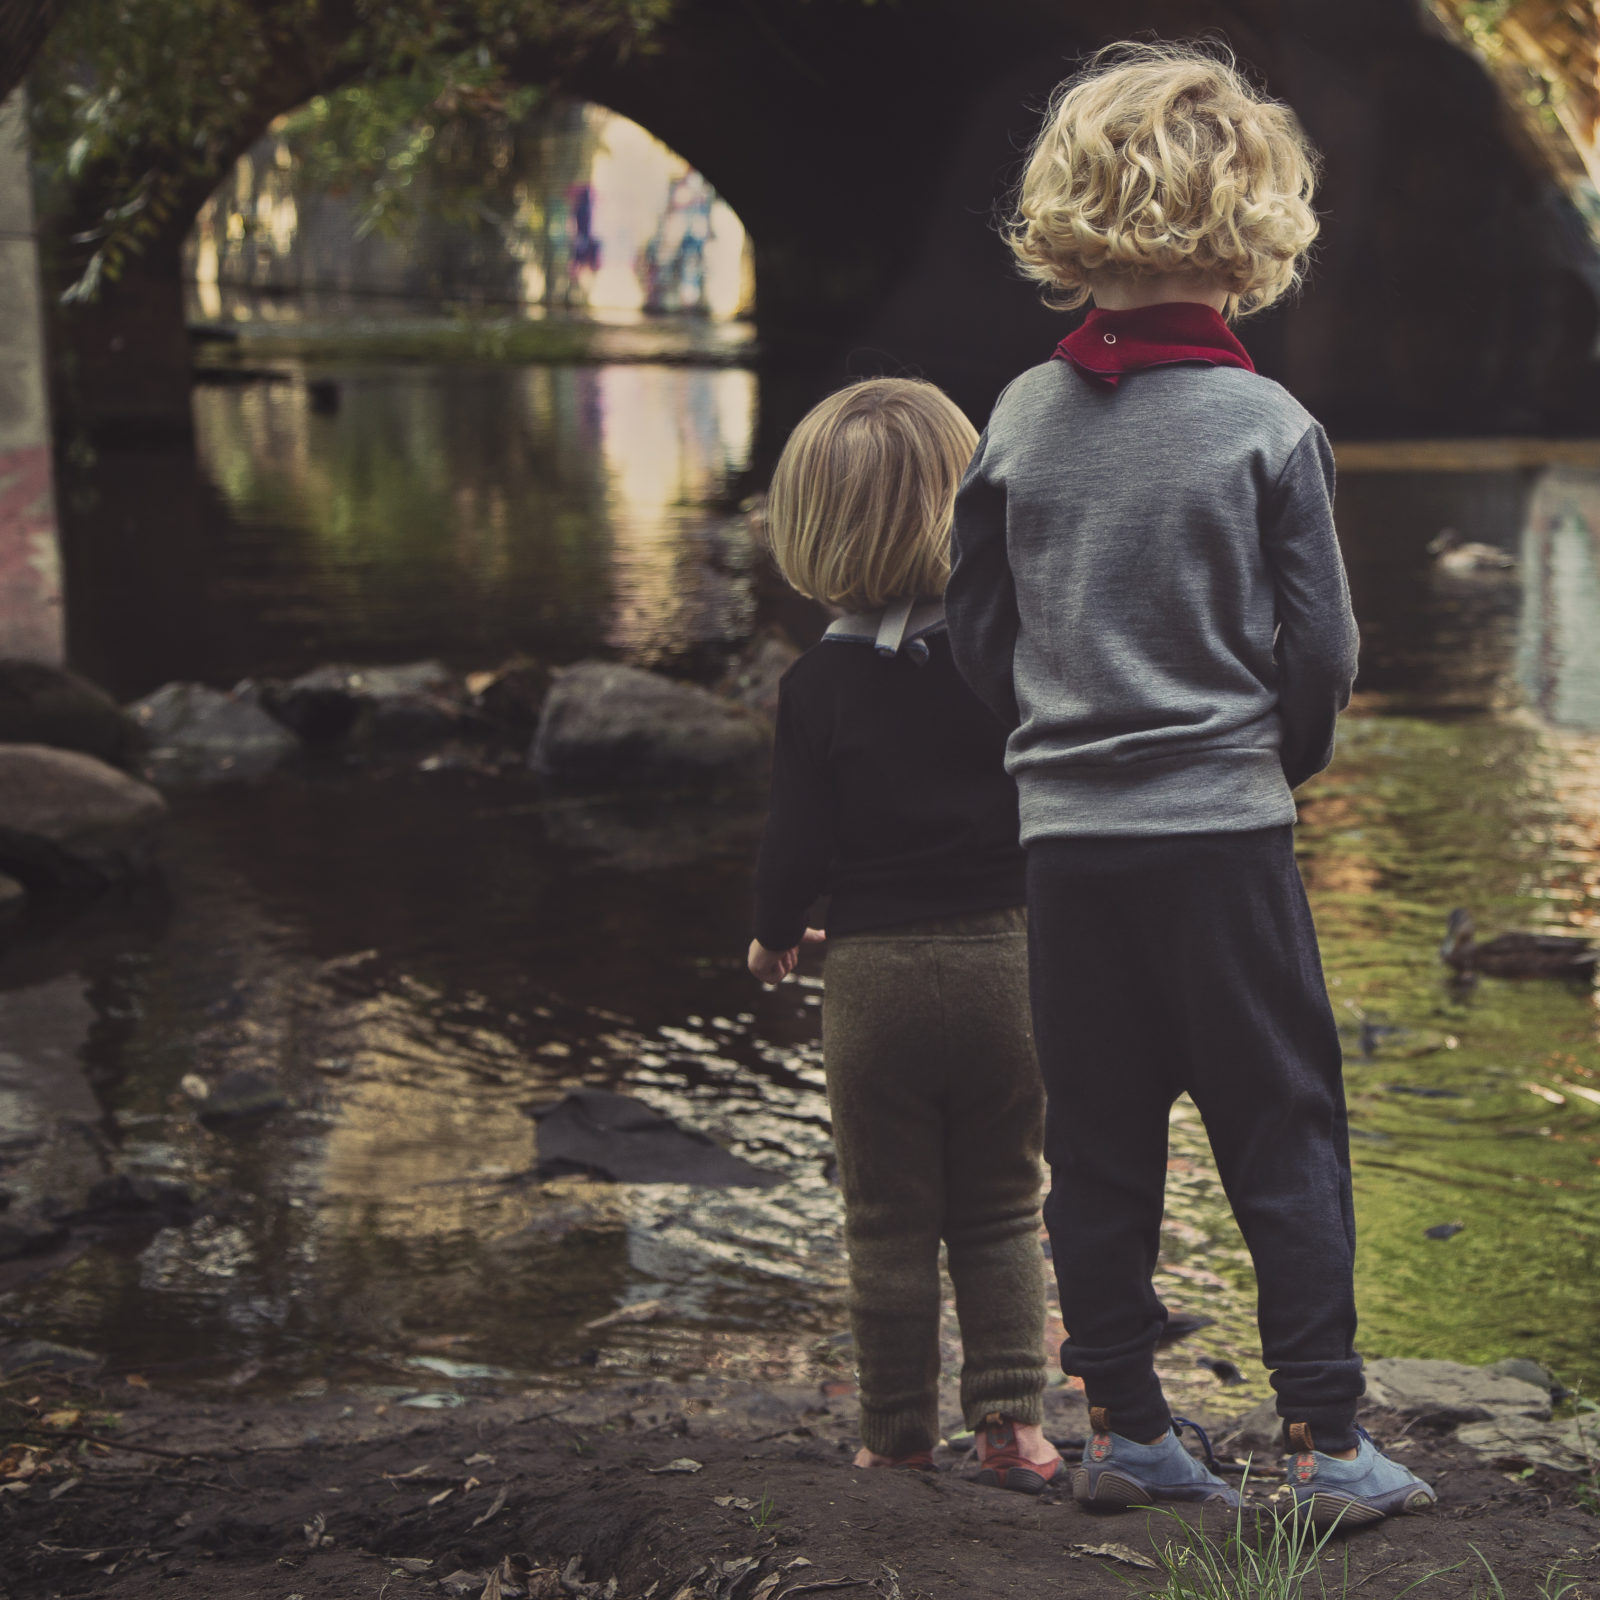 Nina Krake und Tabea Börner | For Schur | Kindermode | Zero Waste | GROSS∆RTIG